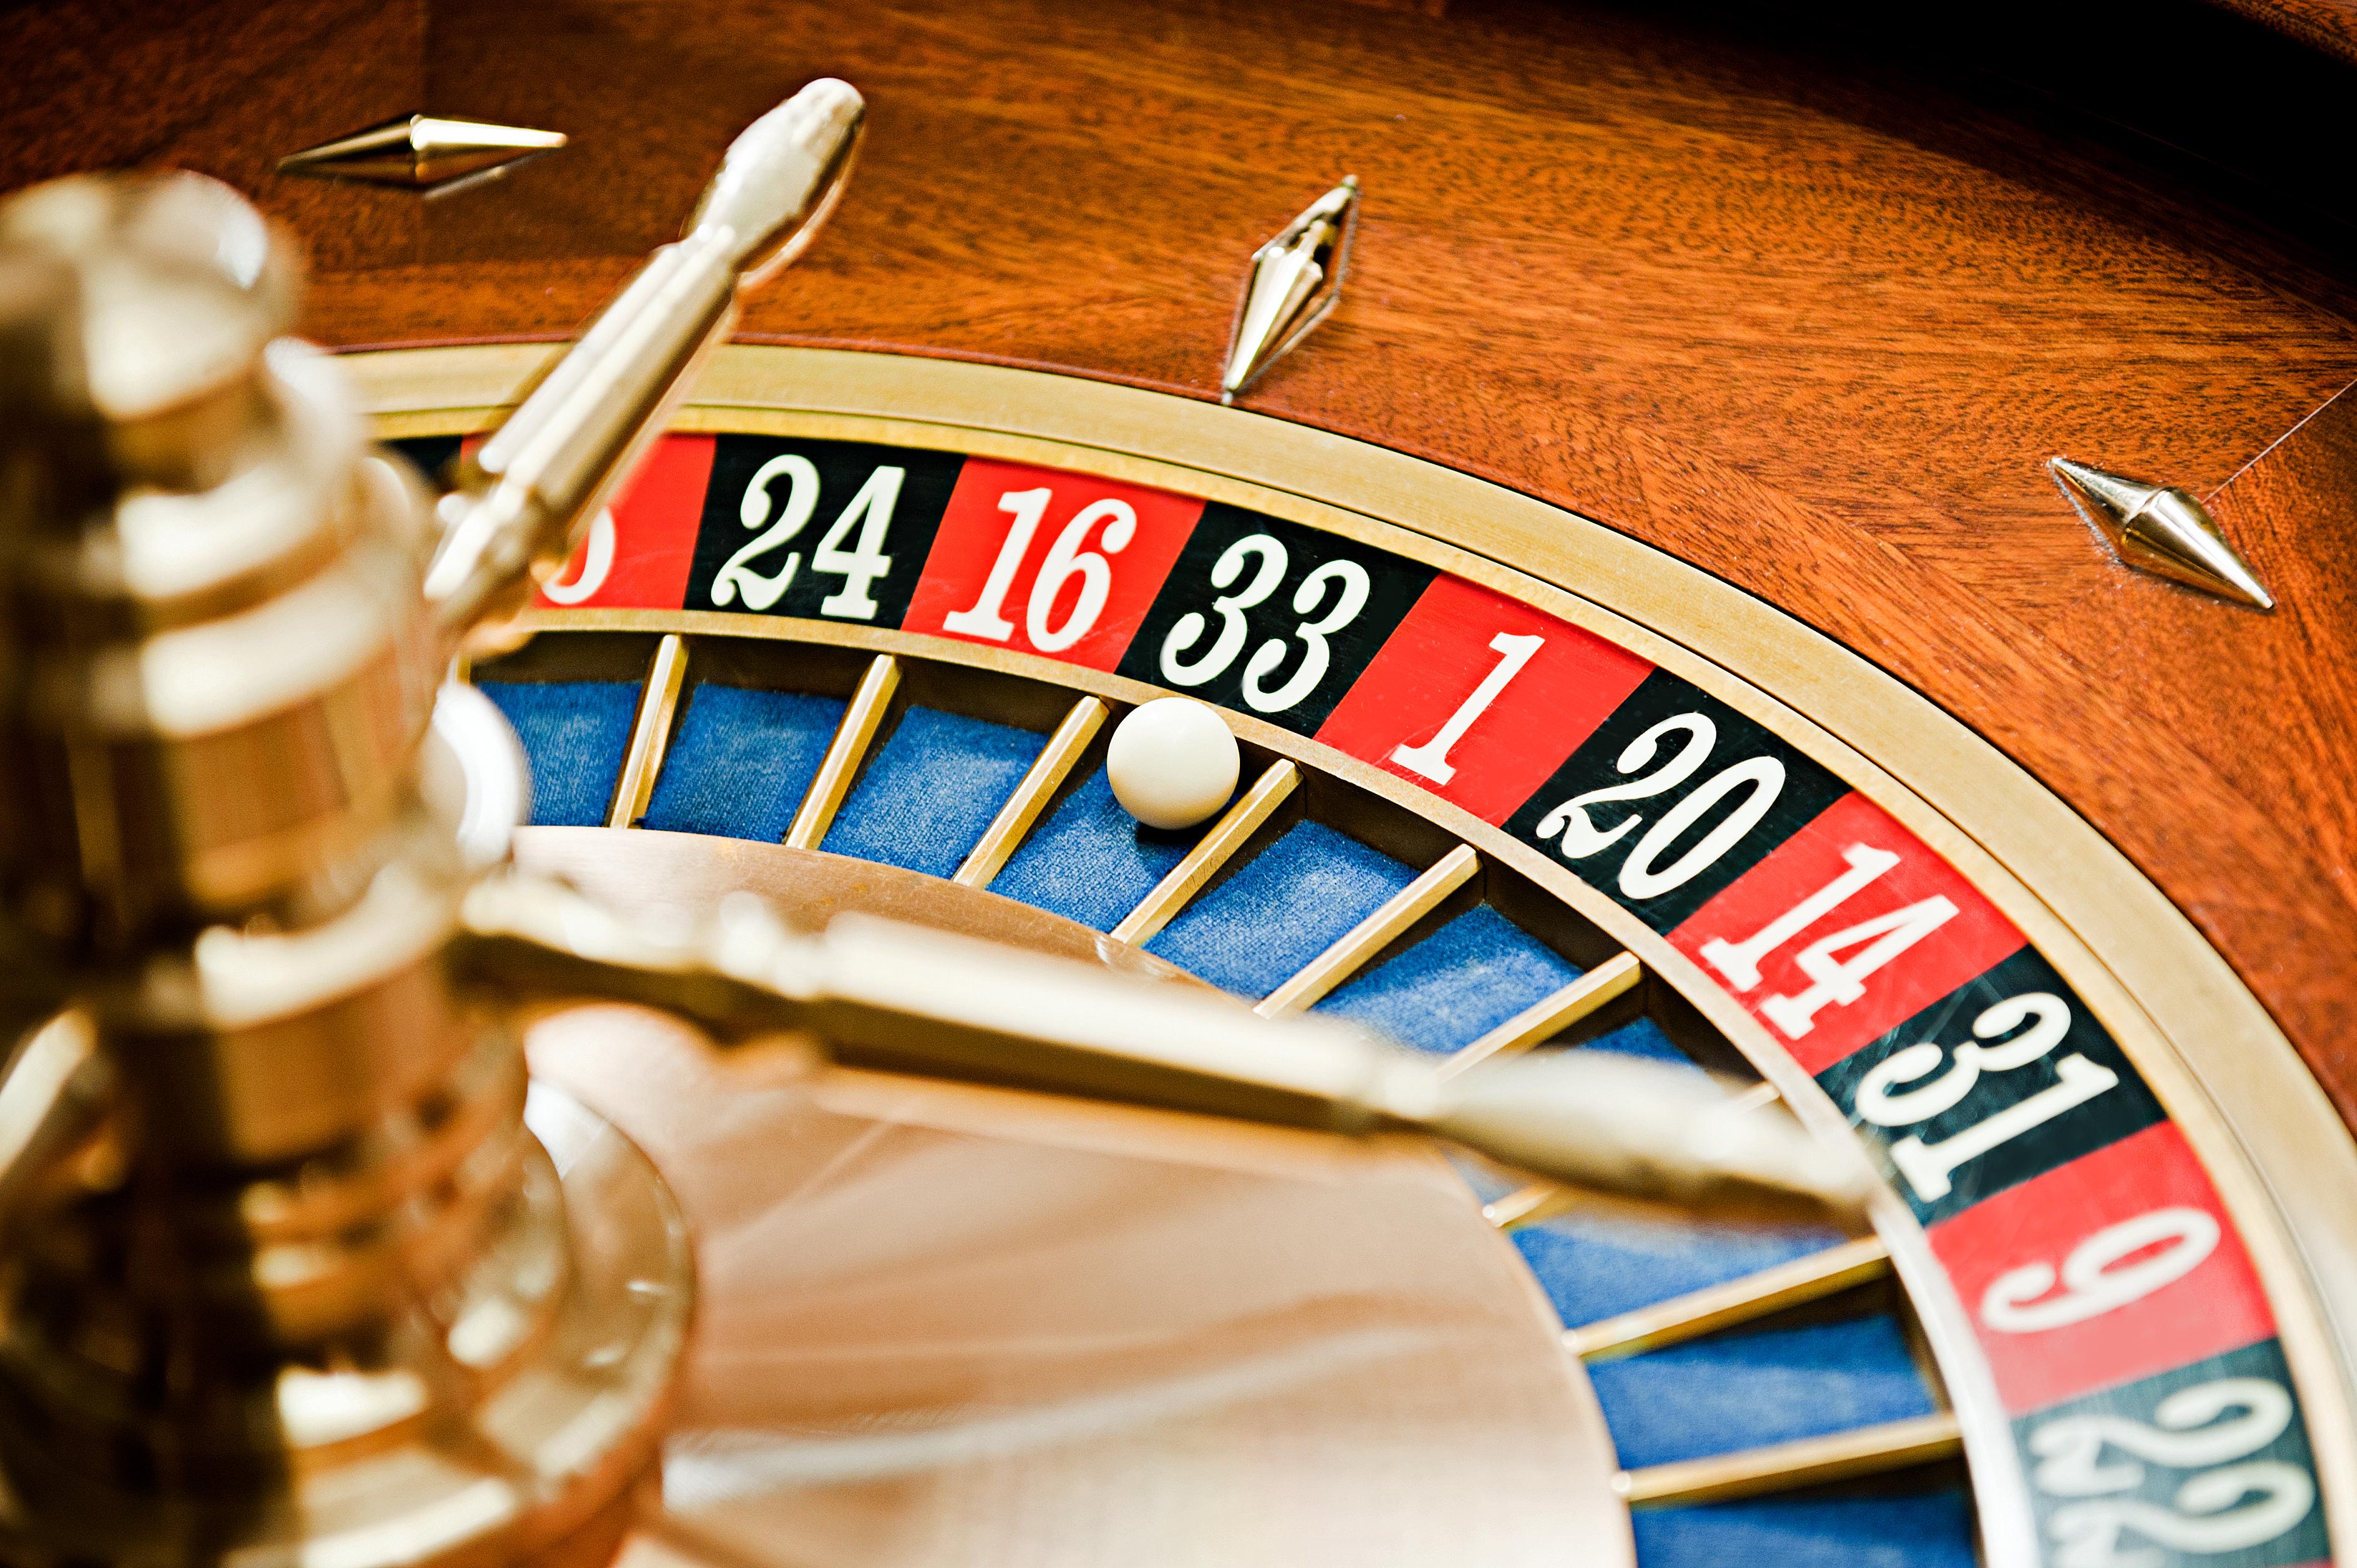 1 mai feiertag casino offen